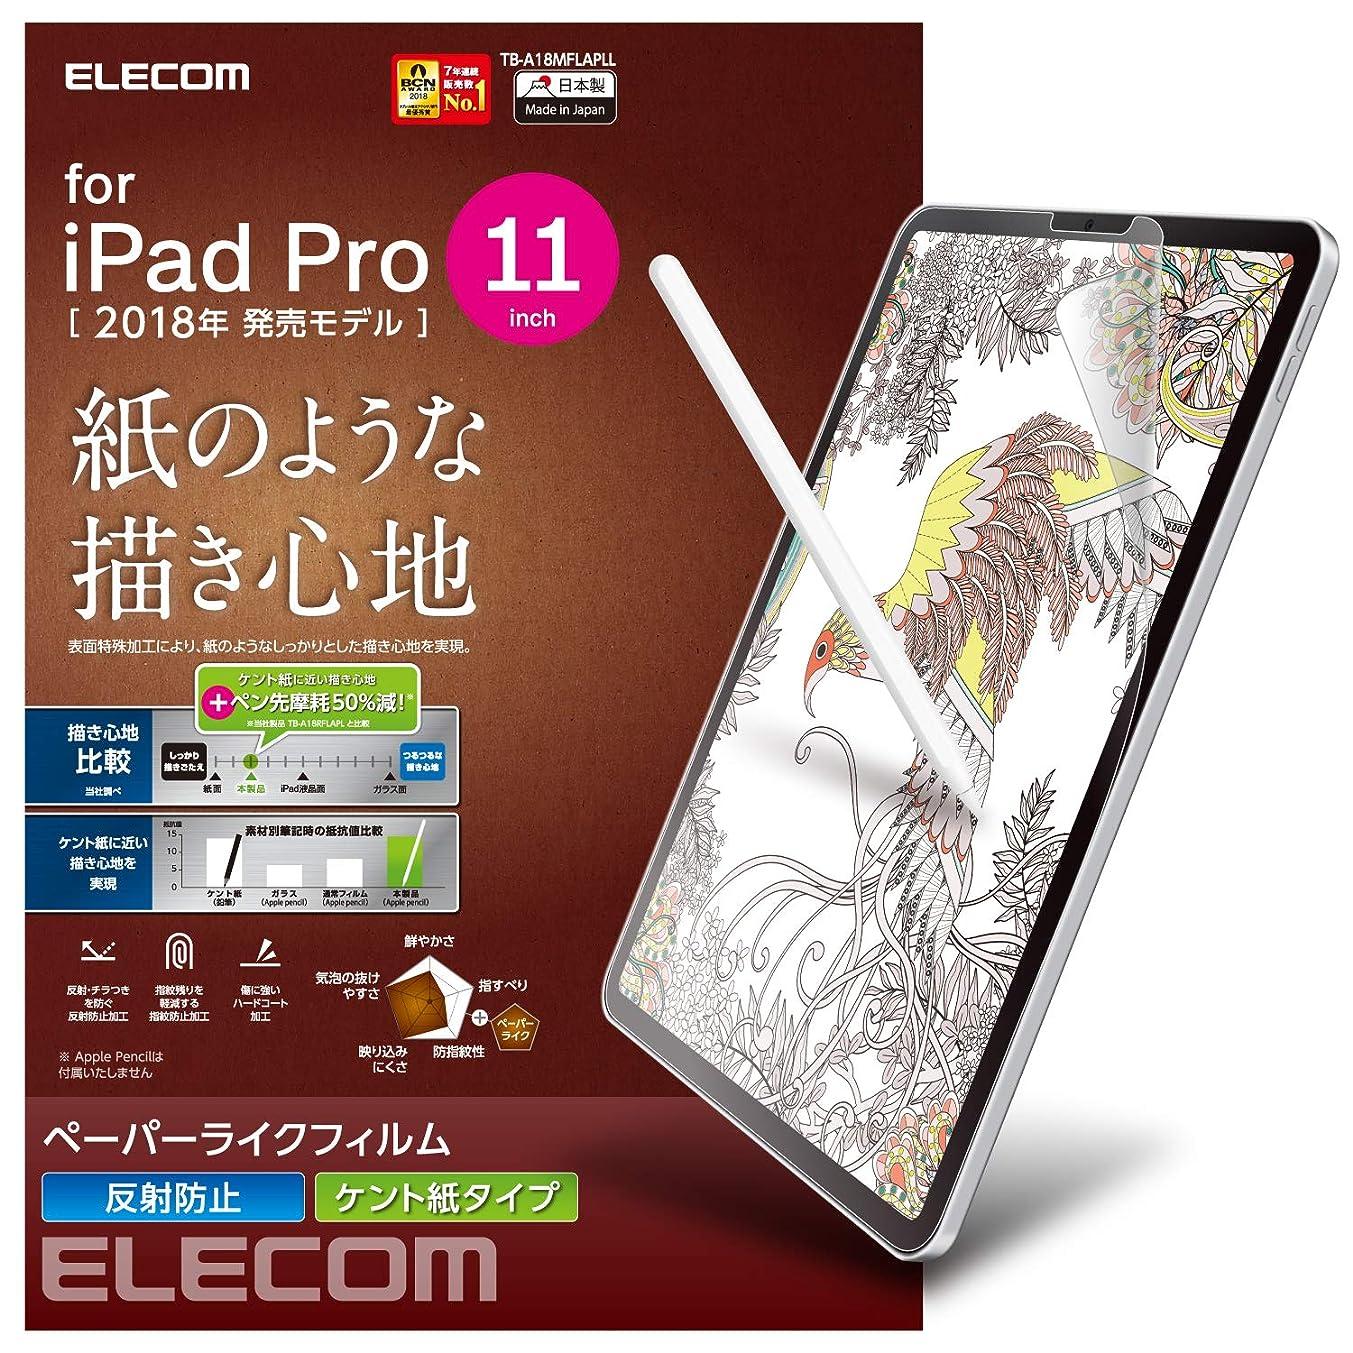 Elecom Paper-Feel Screen Protector for New 2018 iPad Pro 11 inch Anti-Glare Anti-Fingerprint Anti-Scratch Protection Bubble-Free